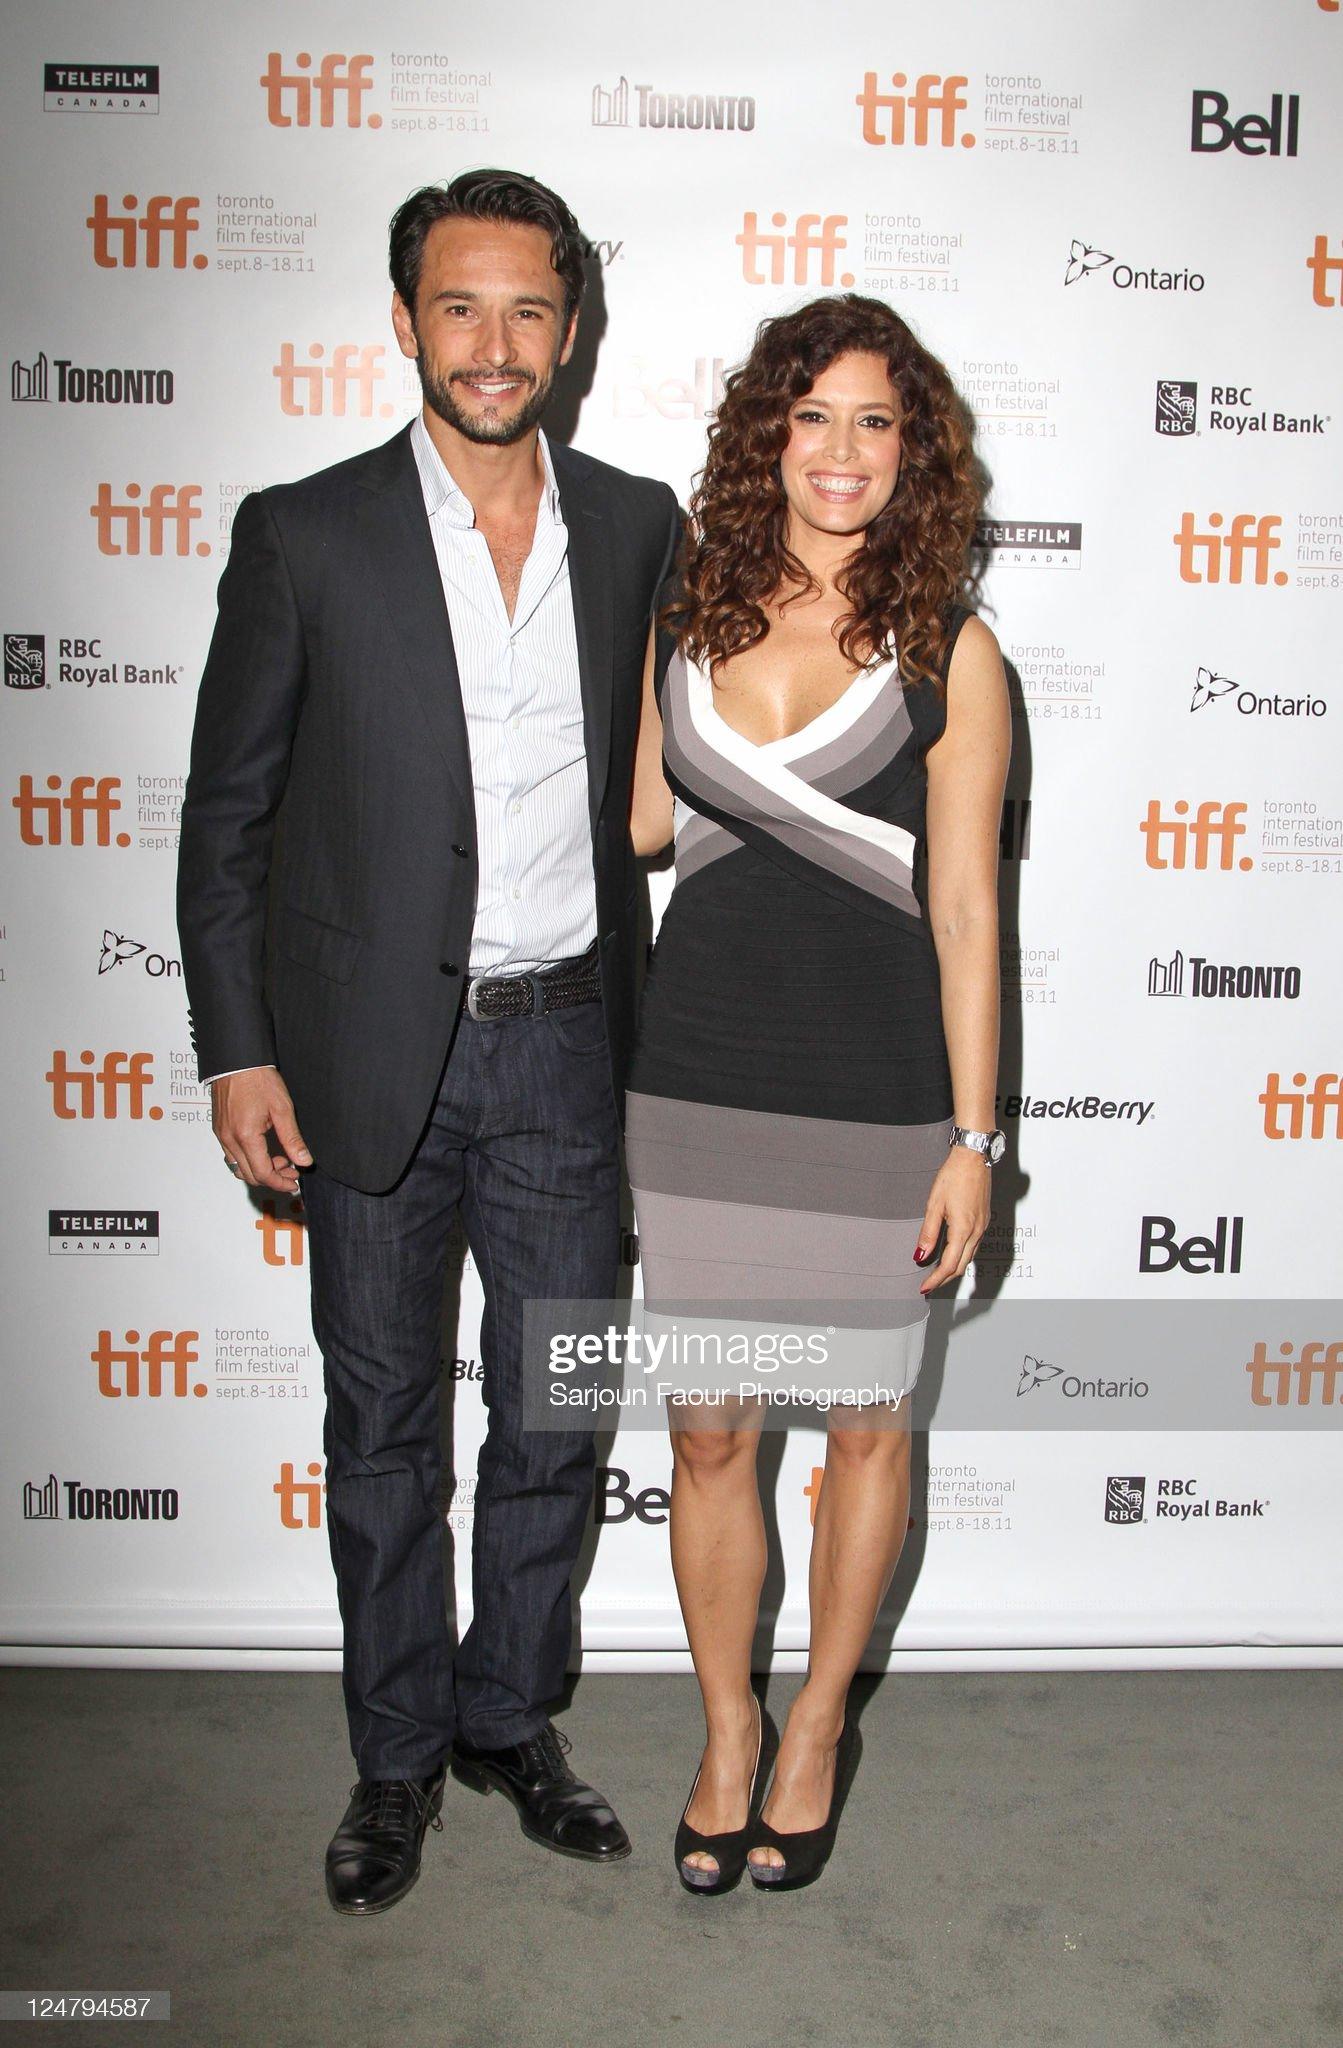 ¿Cuánto mide Rodrigo Santoro? - Altura - Real height Actor-rodrigo-santoro-and-actress-angie-cepeda-attend-heleno-premiere-picture-id124794587?s=2048x2048